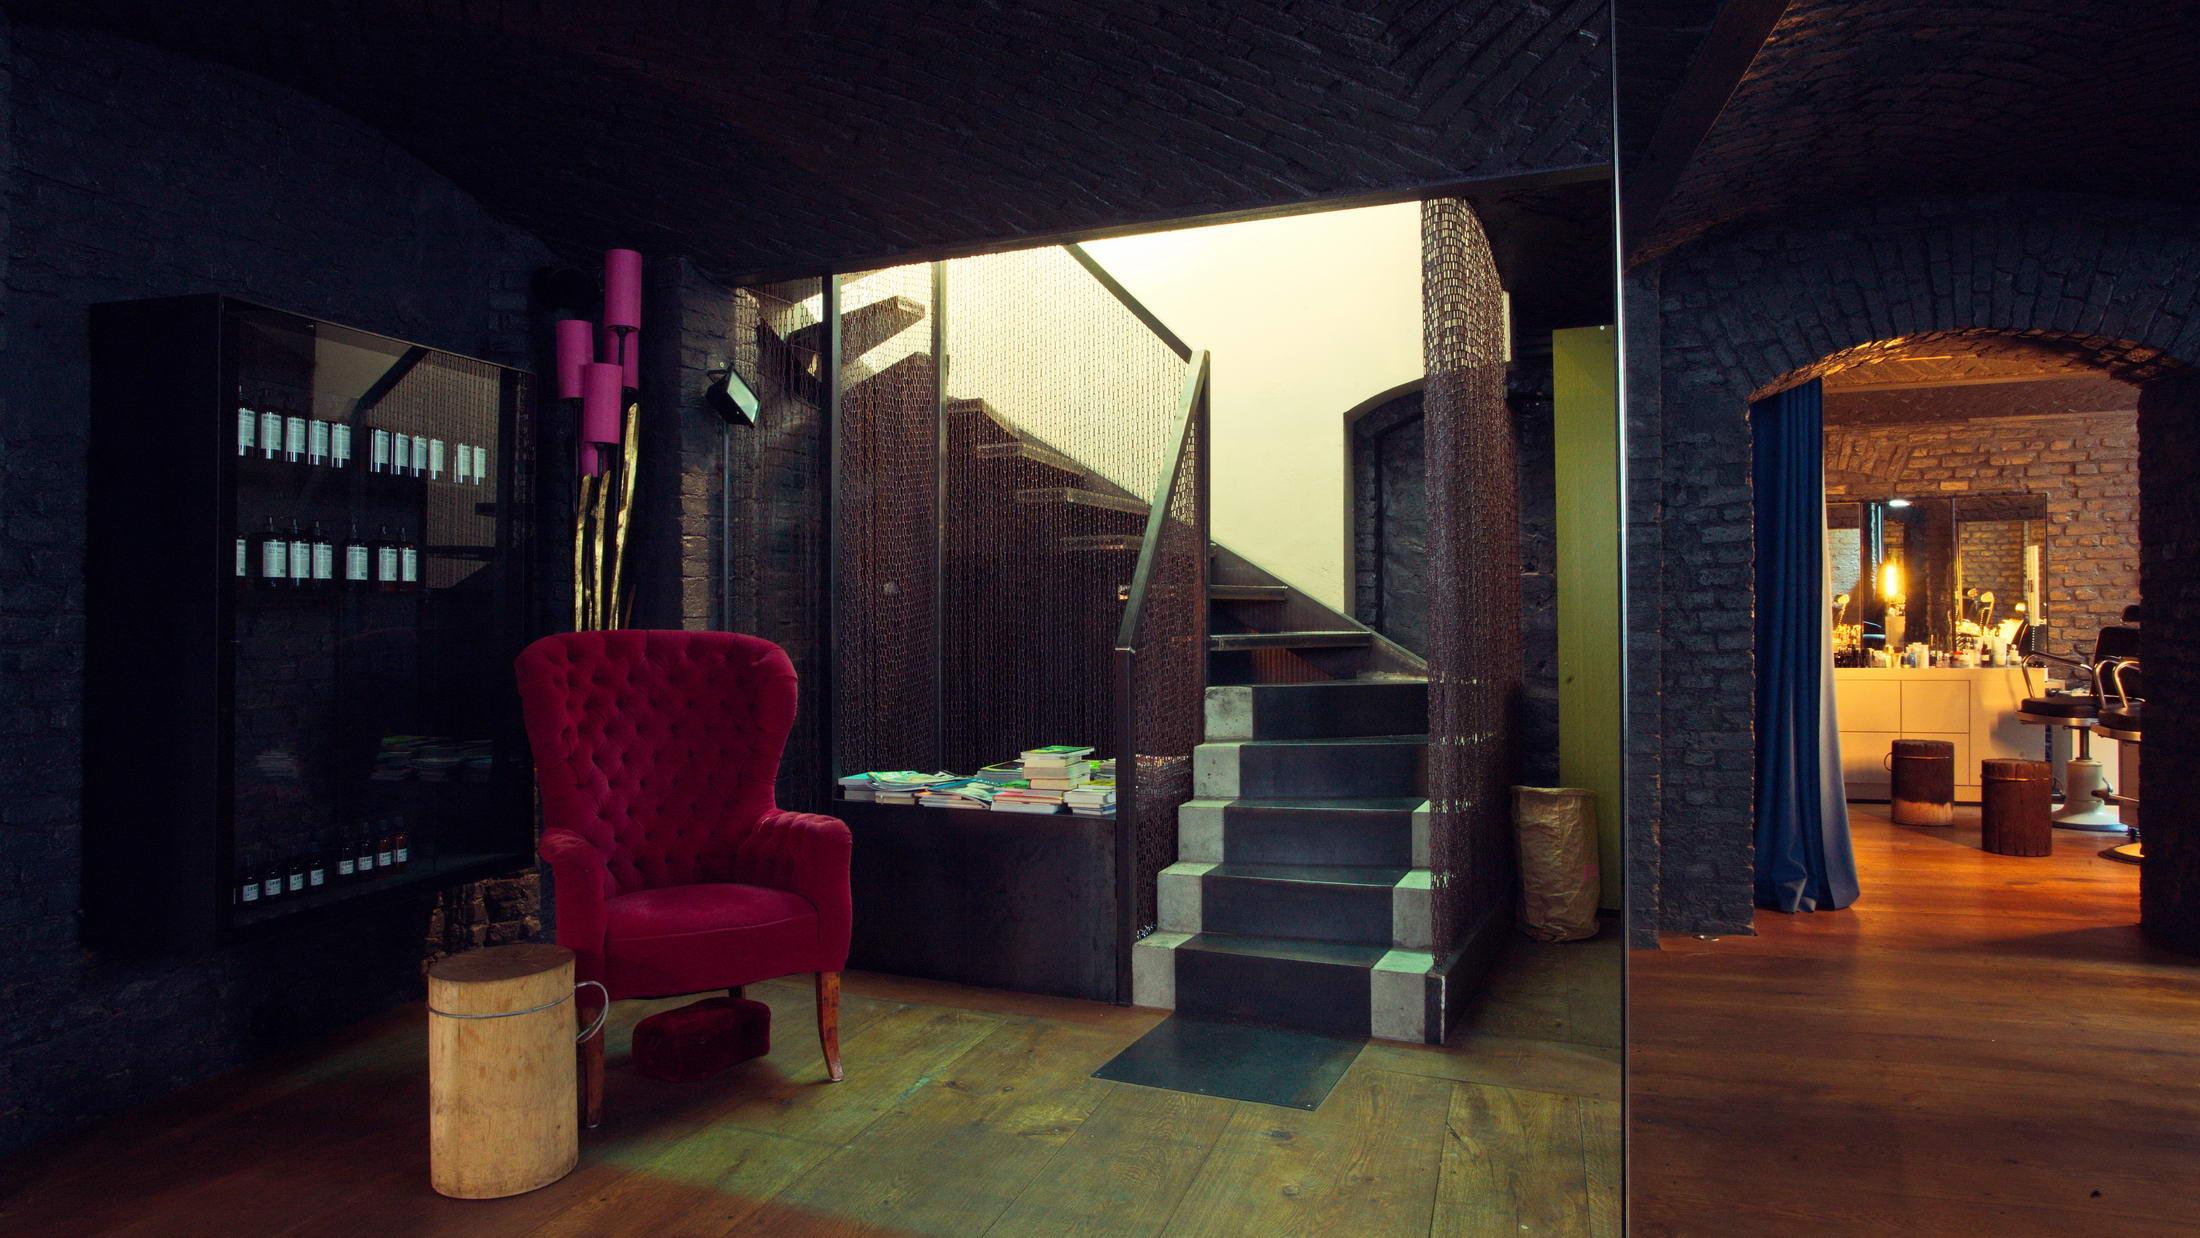 Wheadon Barbershop  Locationfotografie Gregor Anthes